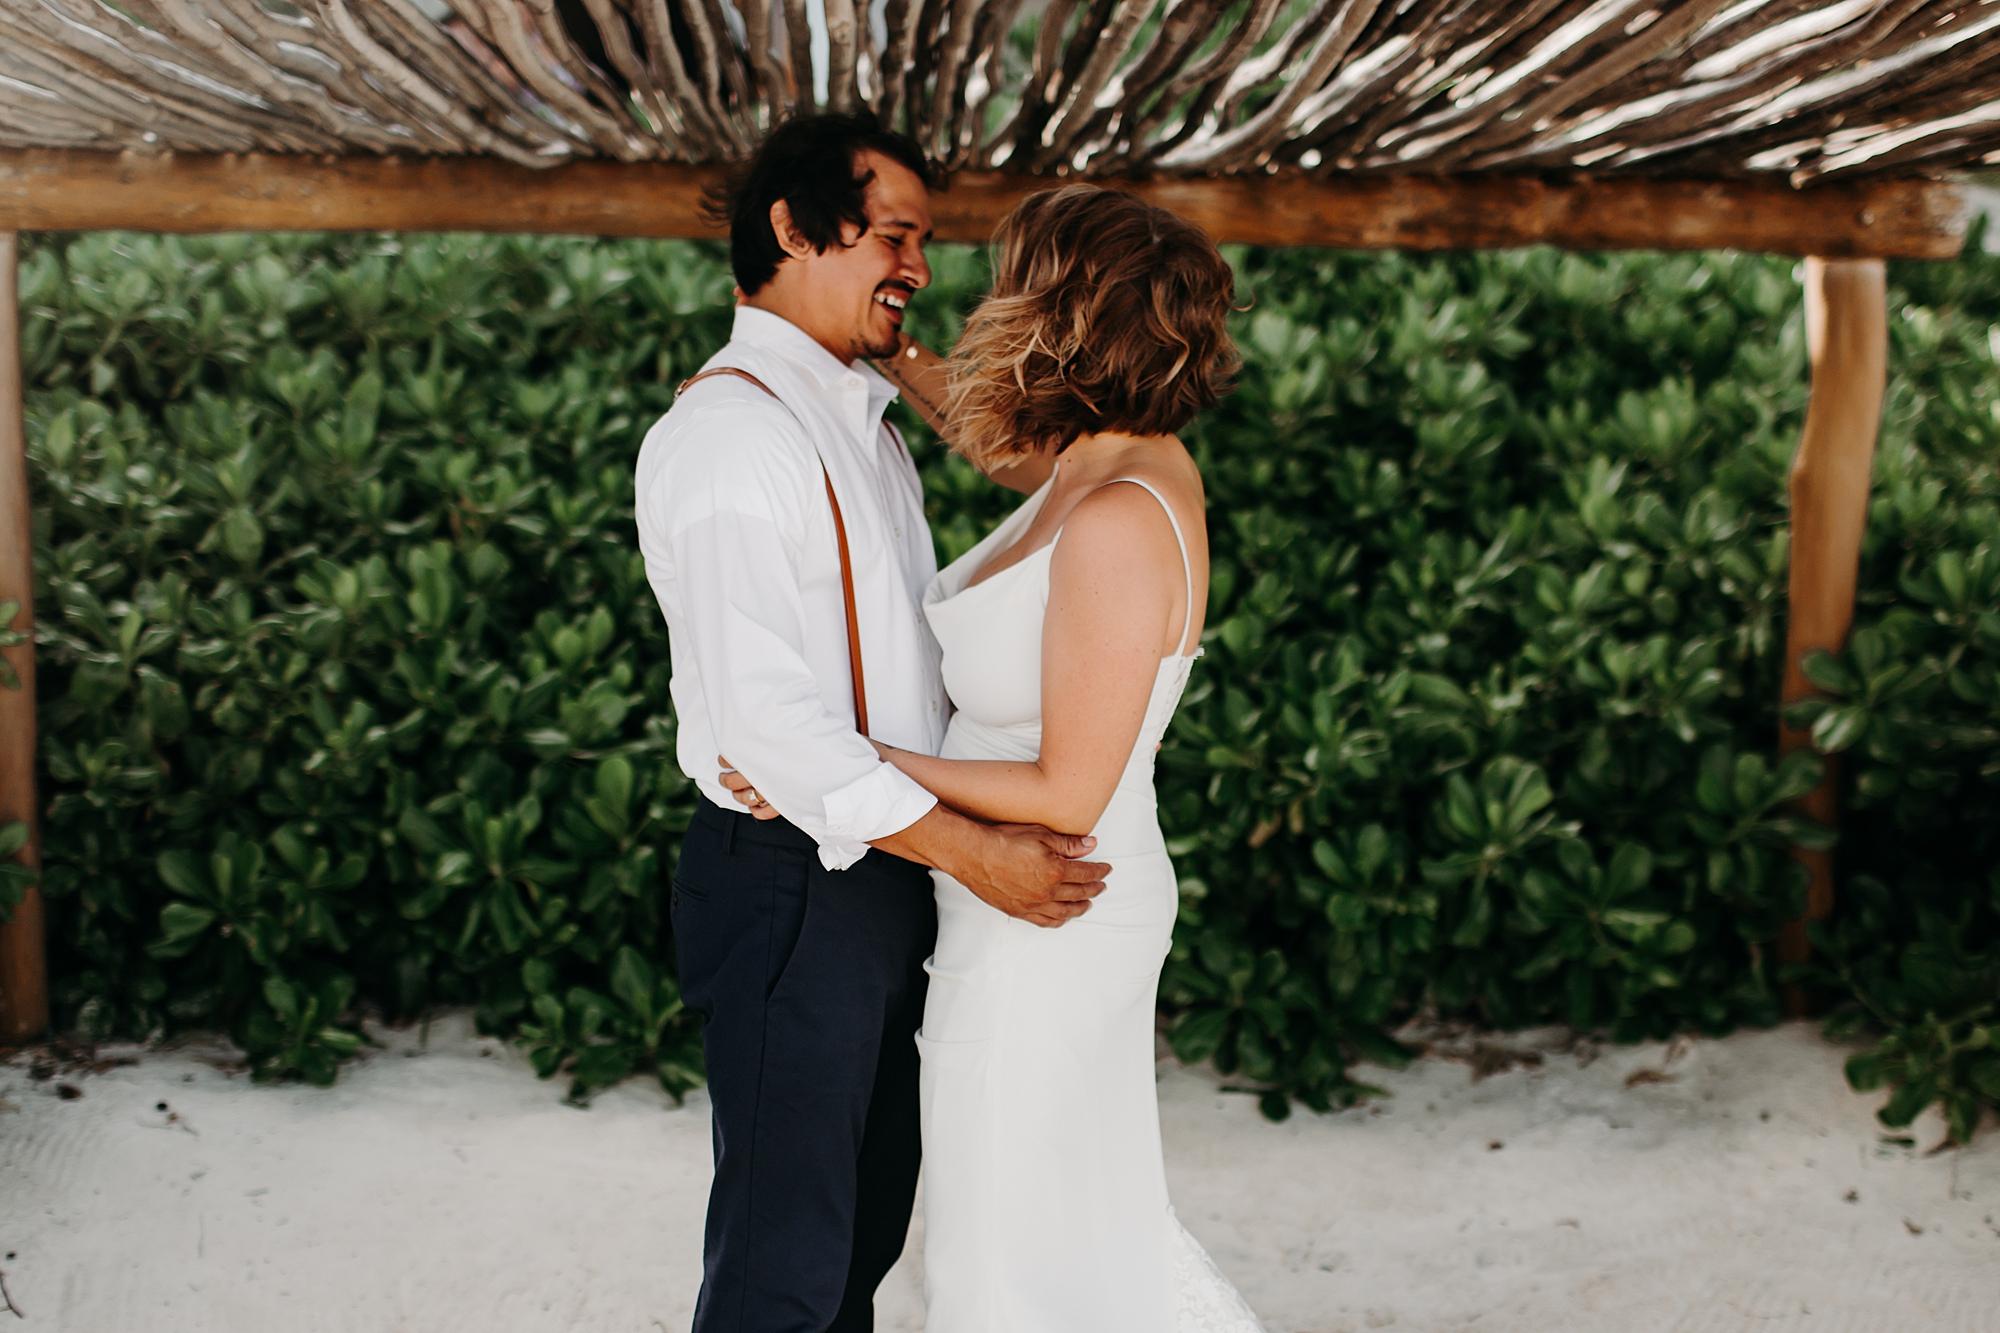 Danielle-San-Antonio-Wedding-Photographer-56_WEB.jpg